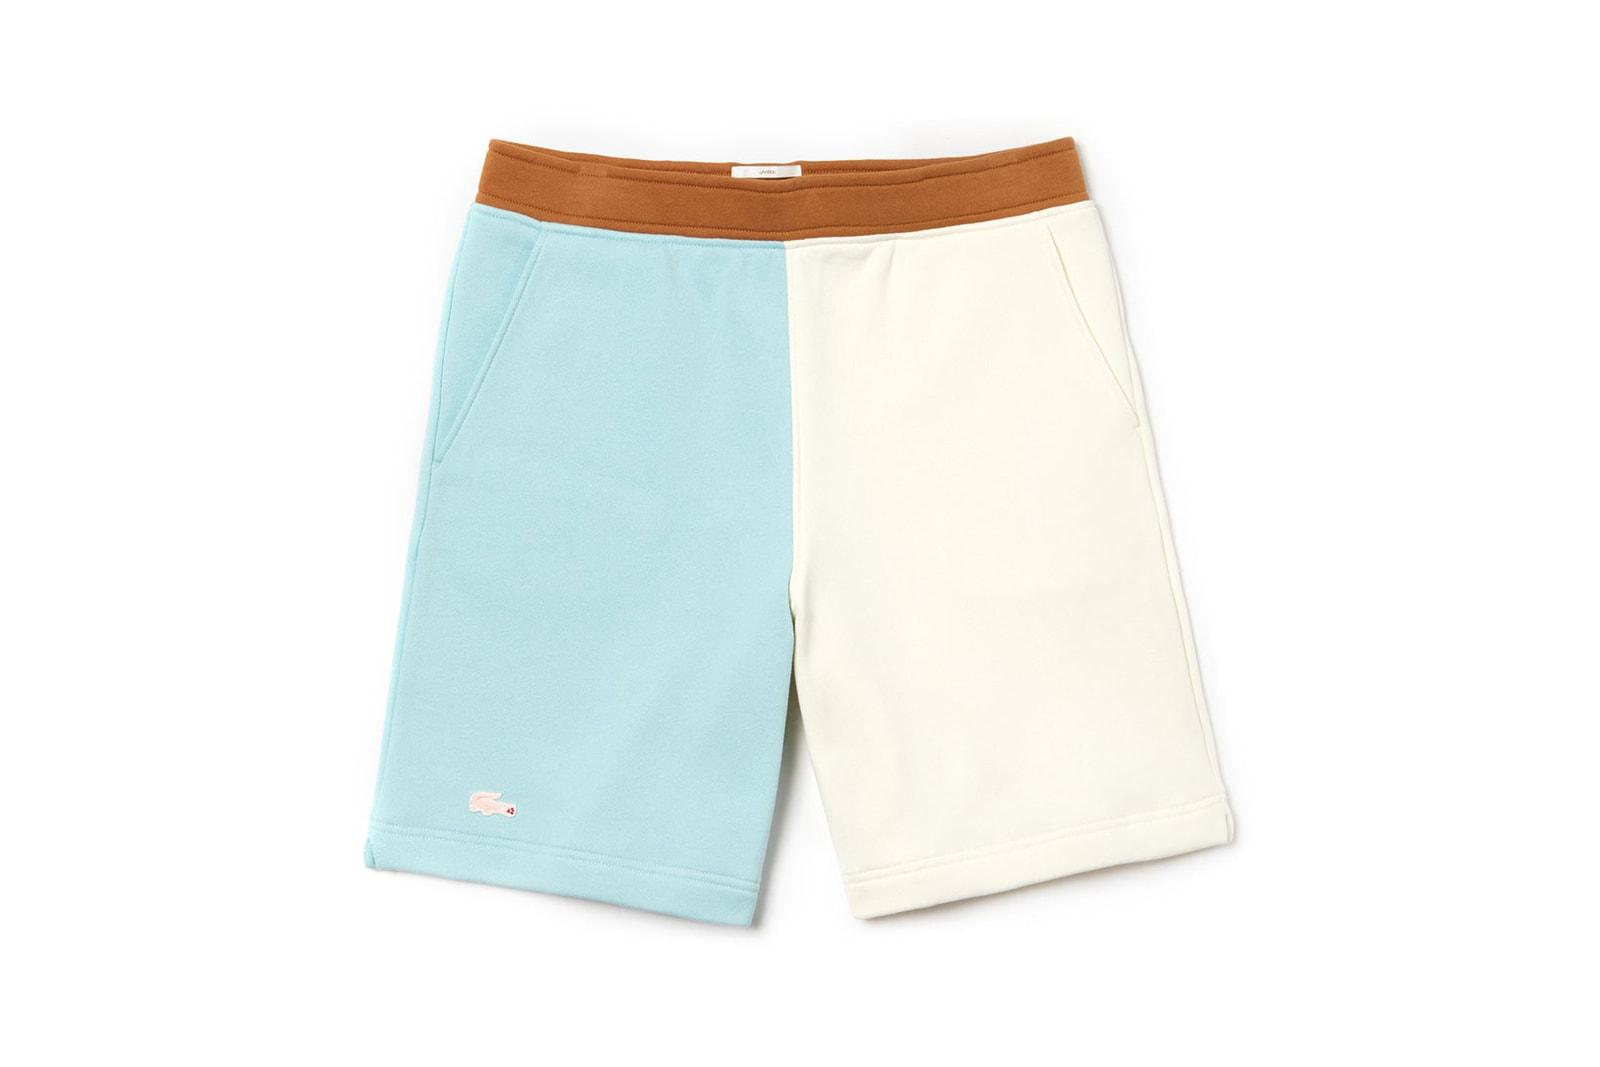 tyler the creator golf le fleur lacoste tennis bucket hat sweatshirt polo t-shirt shorts socks